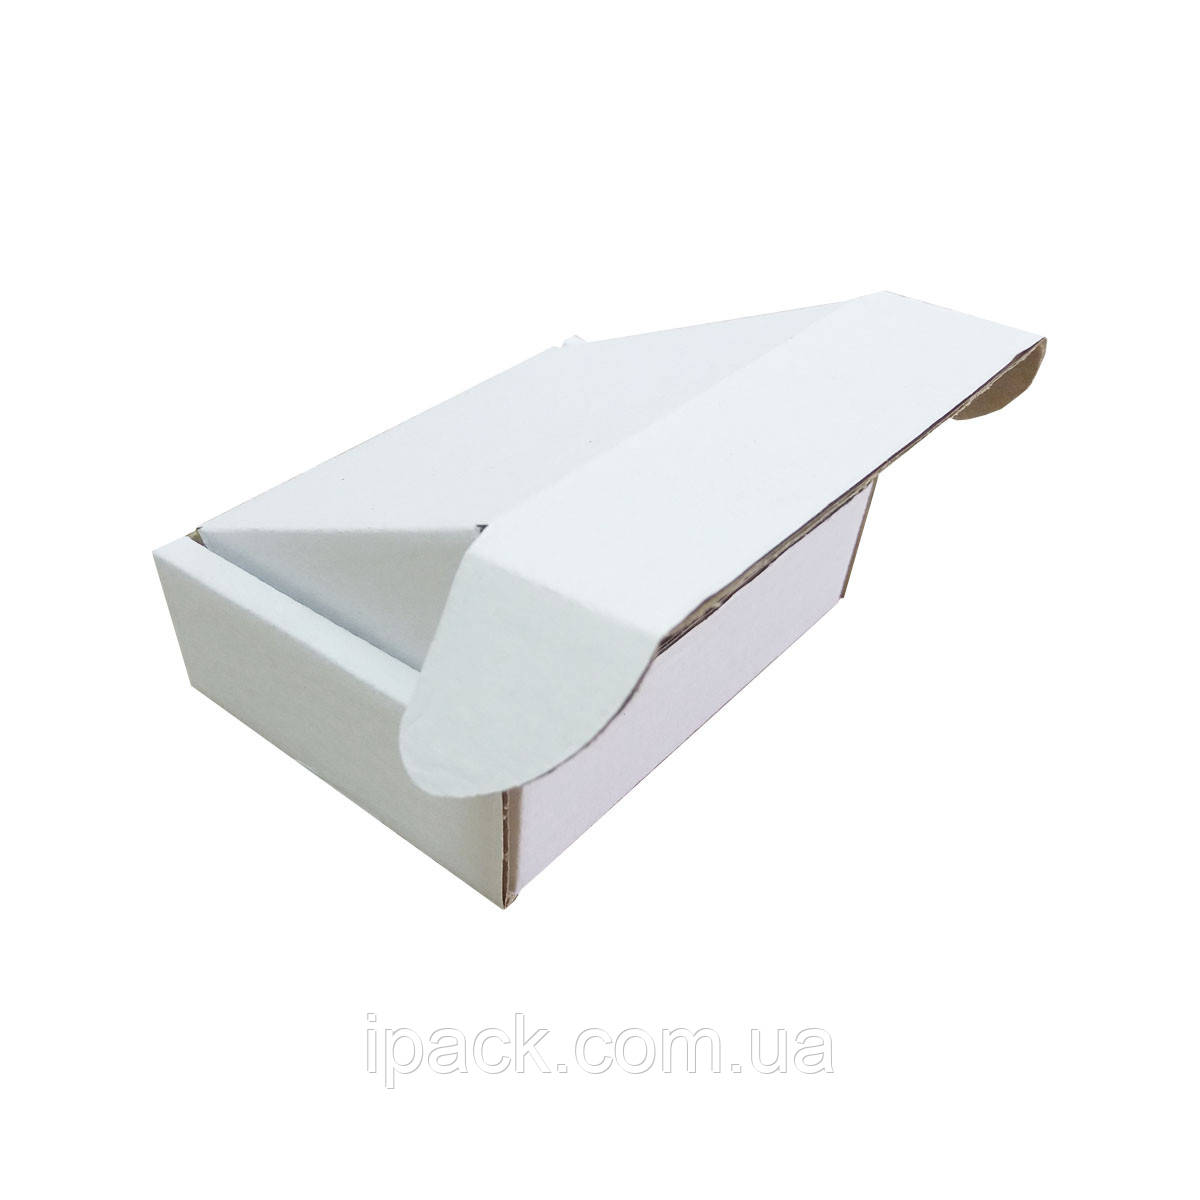 Коробка картонная самосборная 65*35*25 мм белая микрогофрокартон